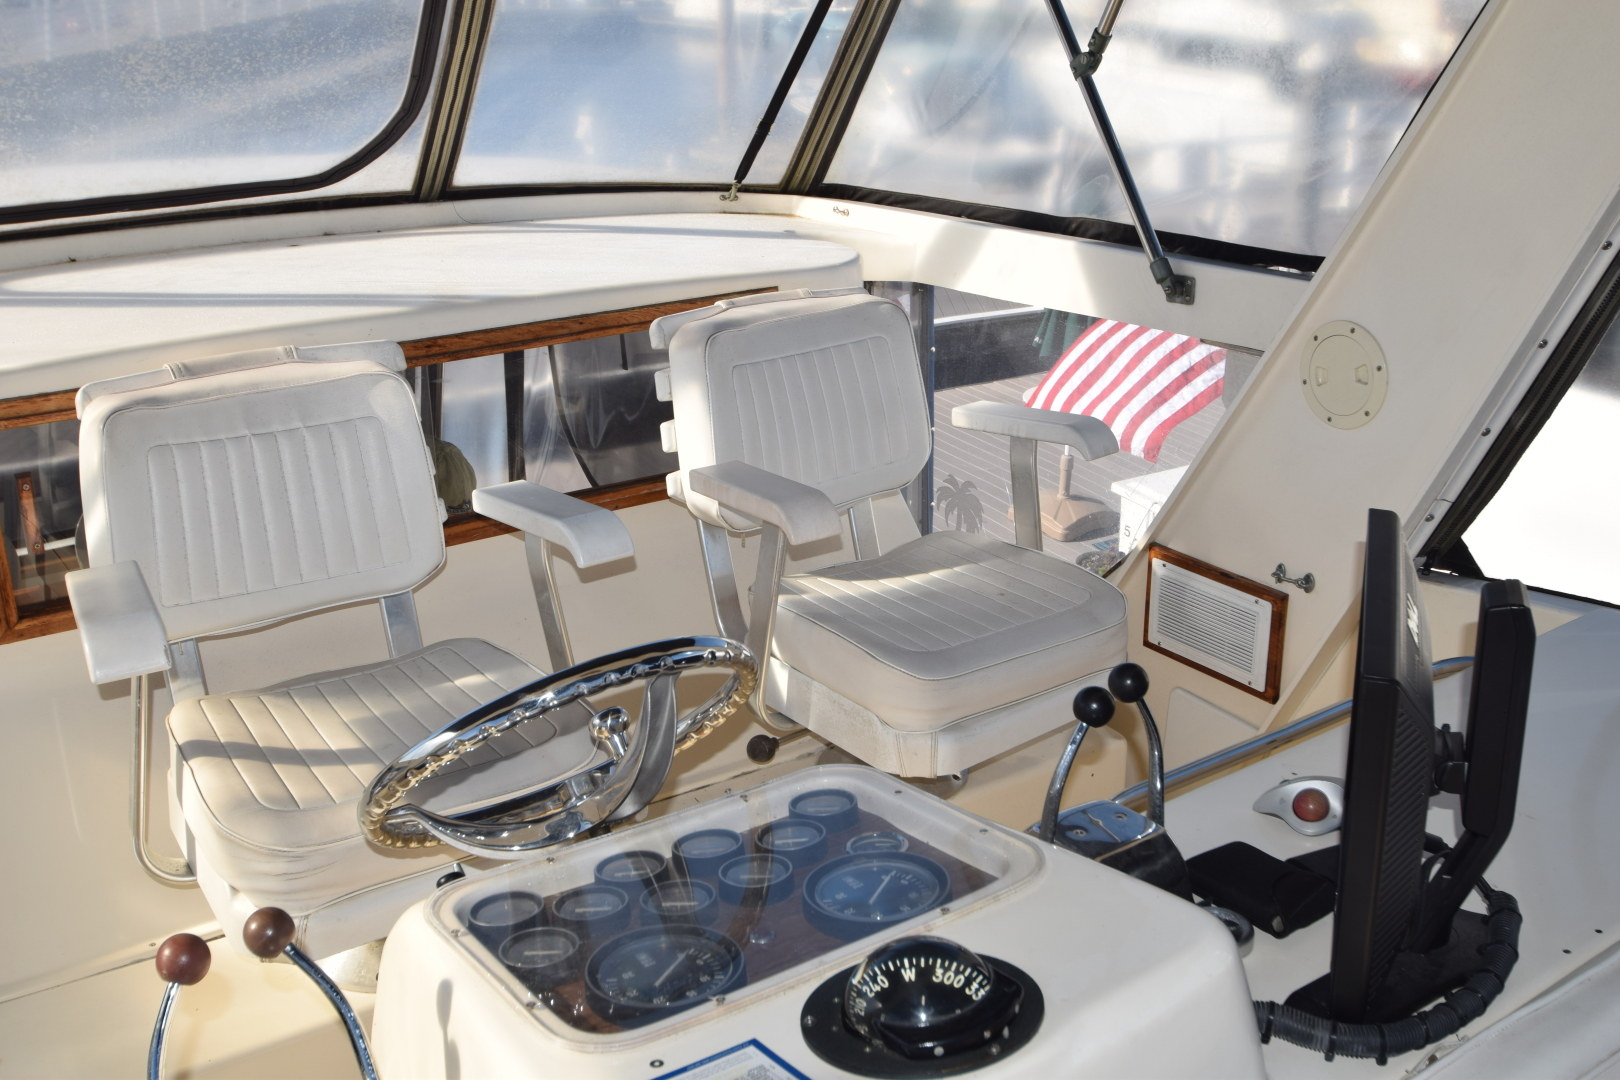 Ocean Yachts-46 Sunliner 1986-Sugah Portsmouth-Virginia-United States-1555486 | Thumbnail